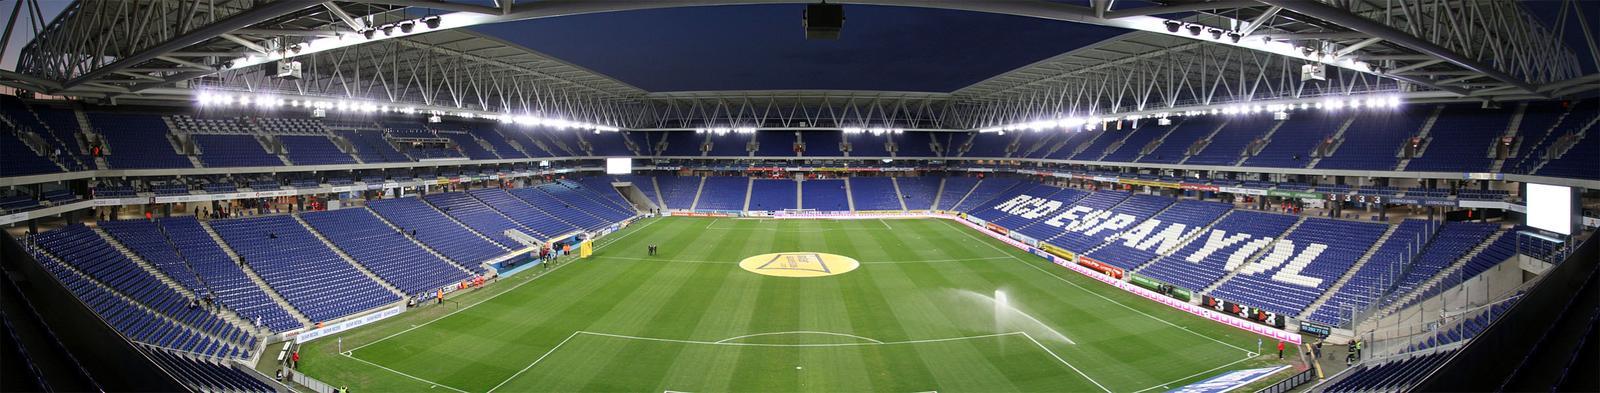 Rcd Espanyol Stadium Tour